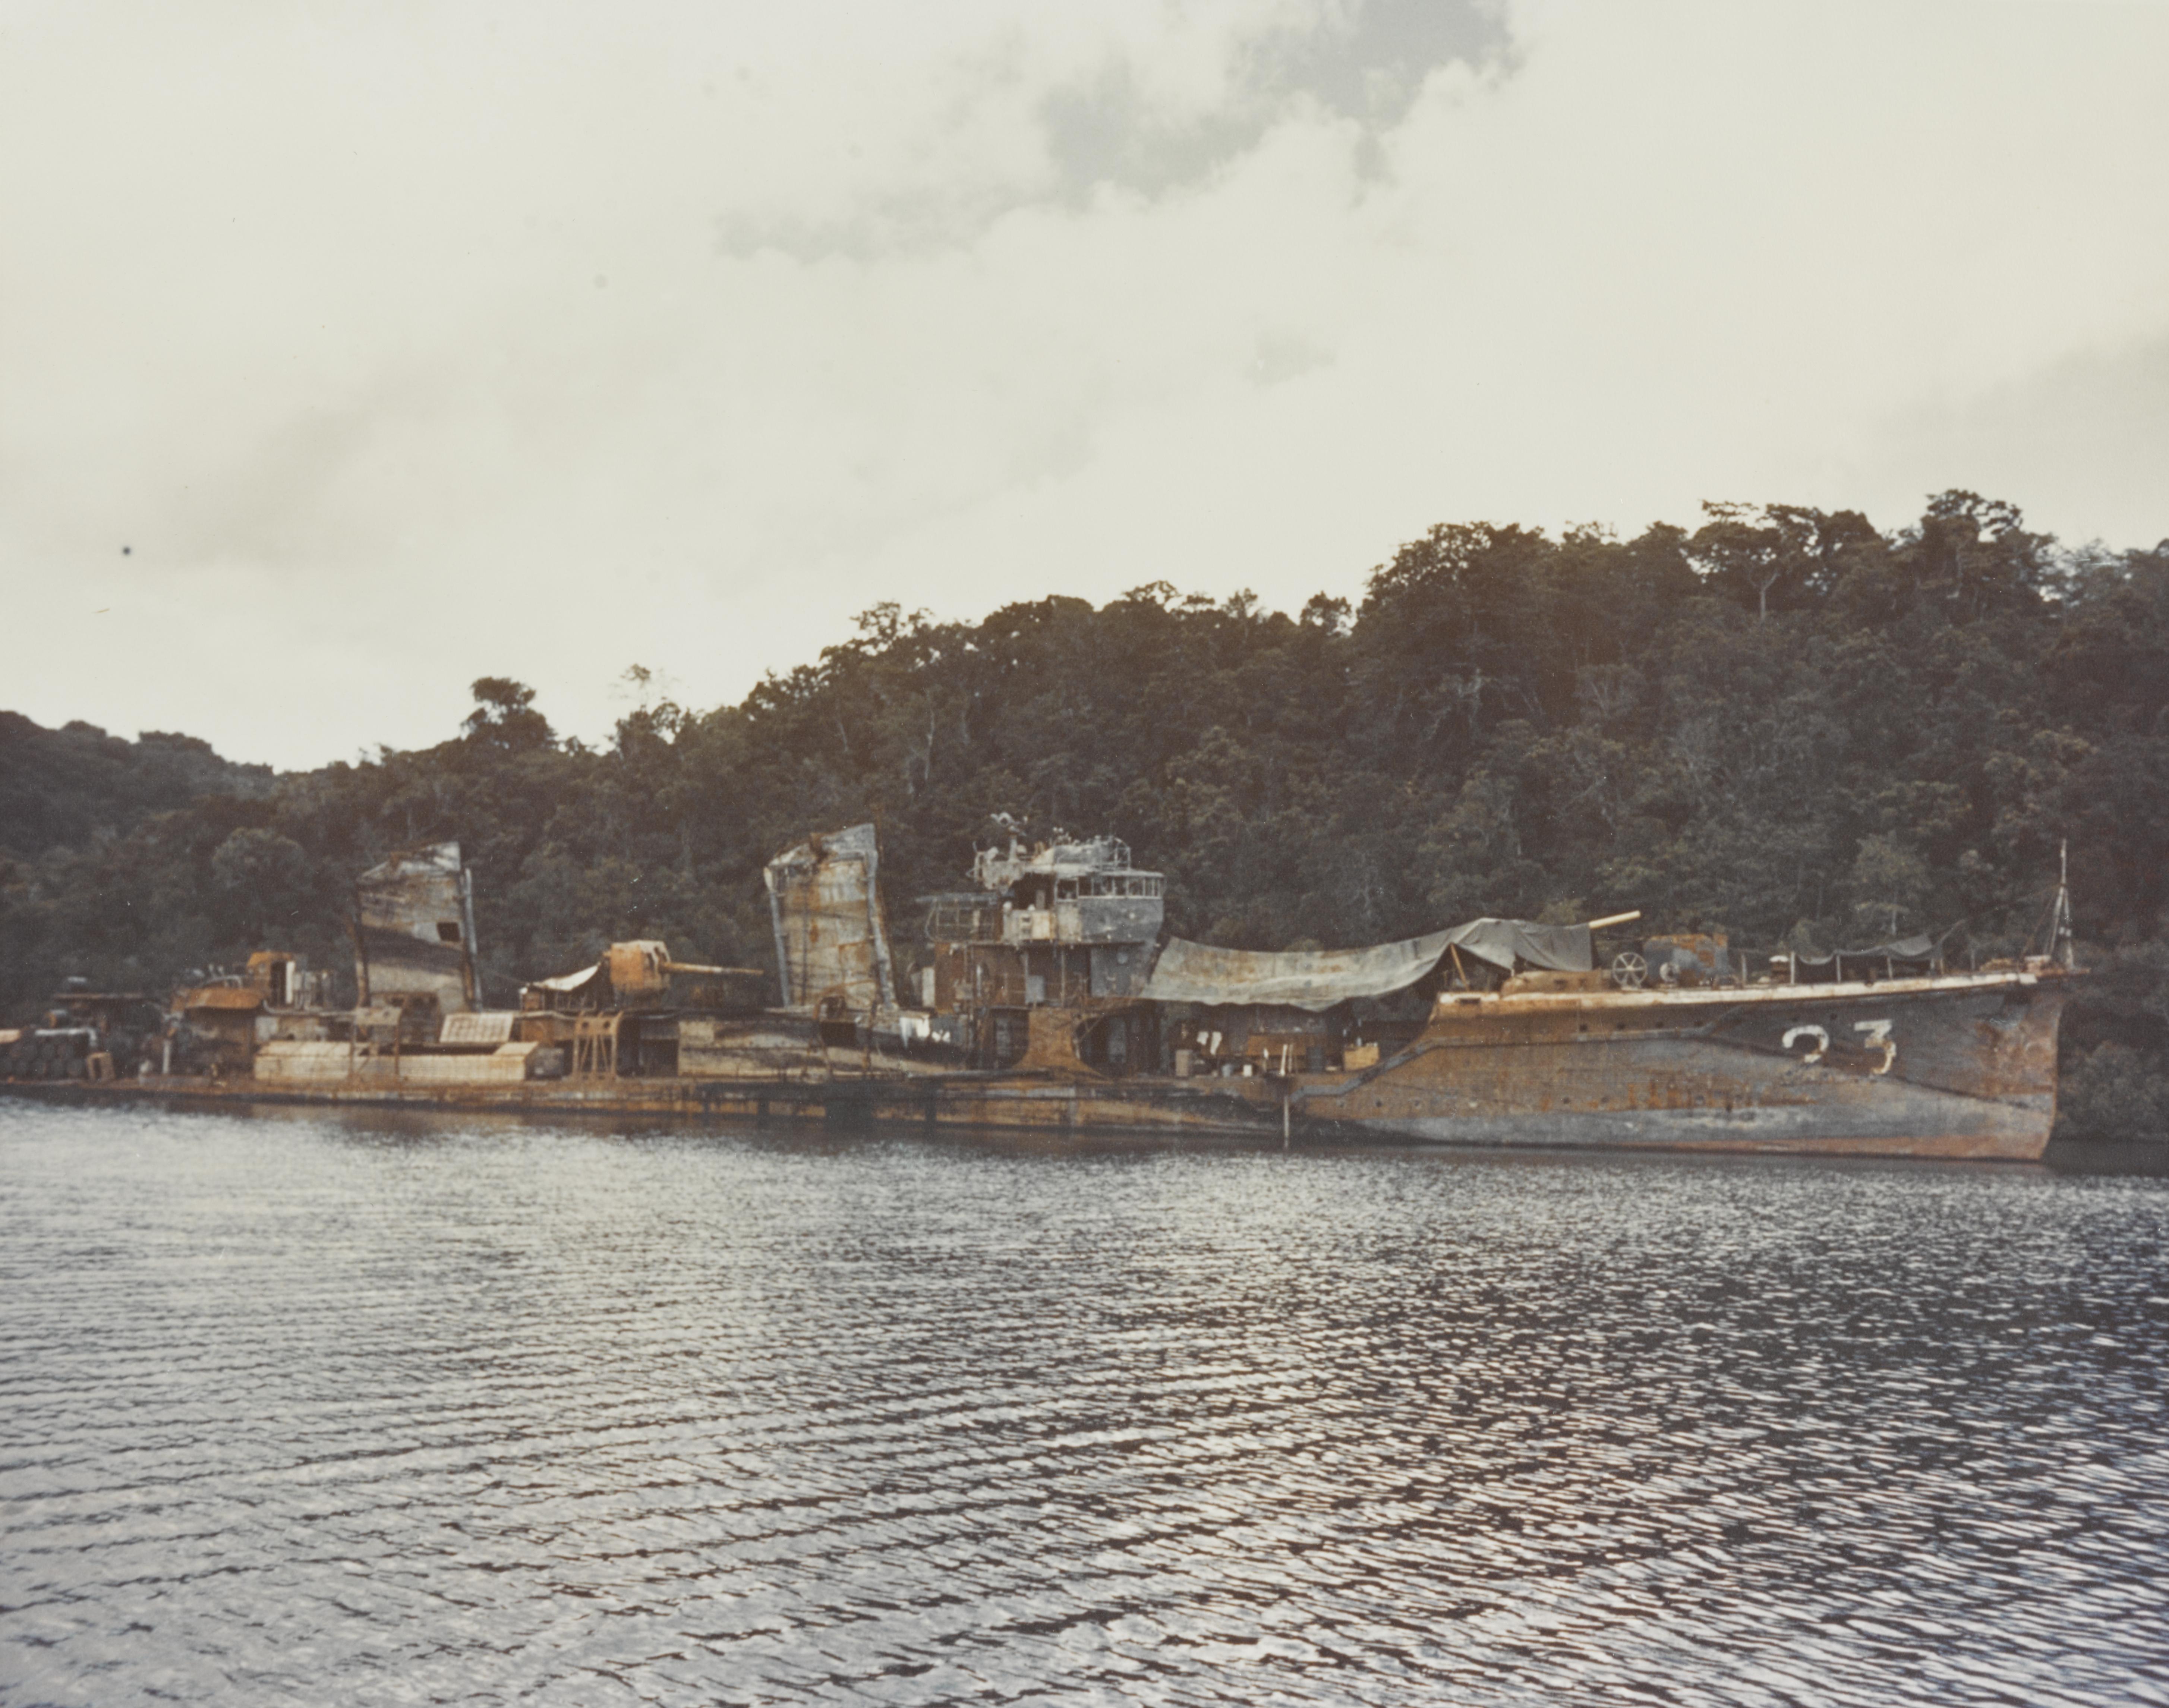 http://upload.wikimedia.org/wikipedia/commons/8/88/Wreck_of_Japanese_destroyer_Kikuzuki_02_in_1944.jpg